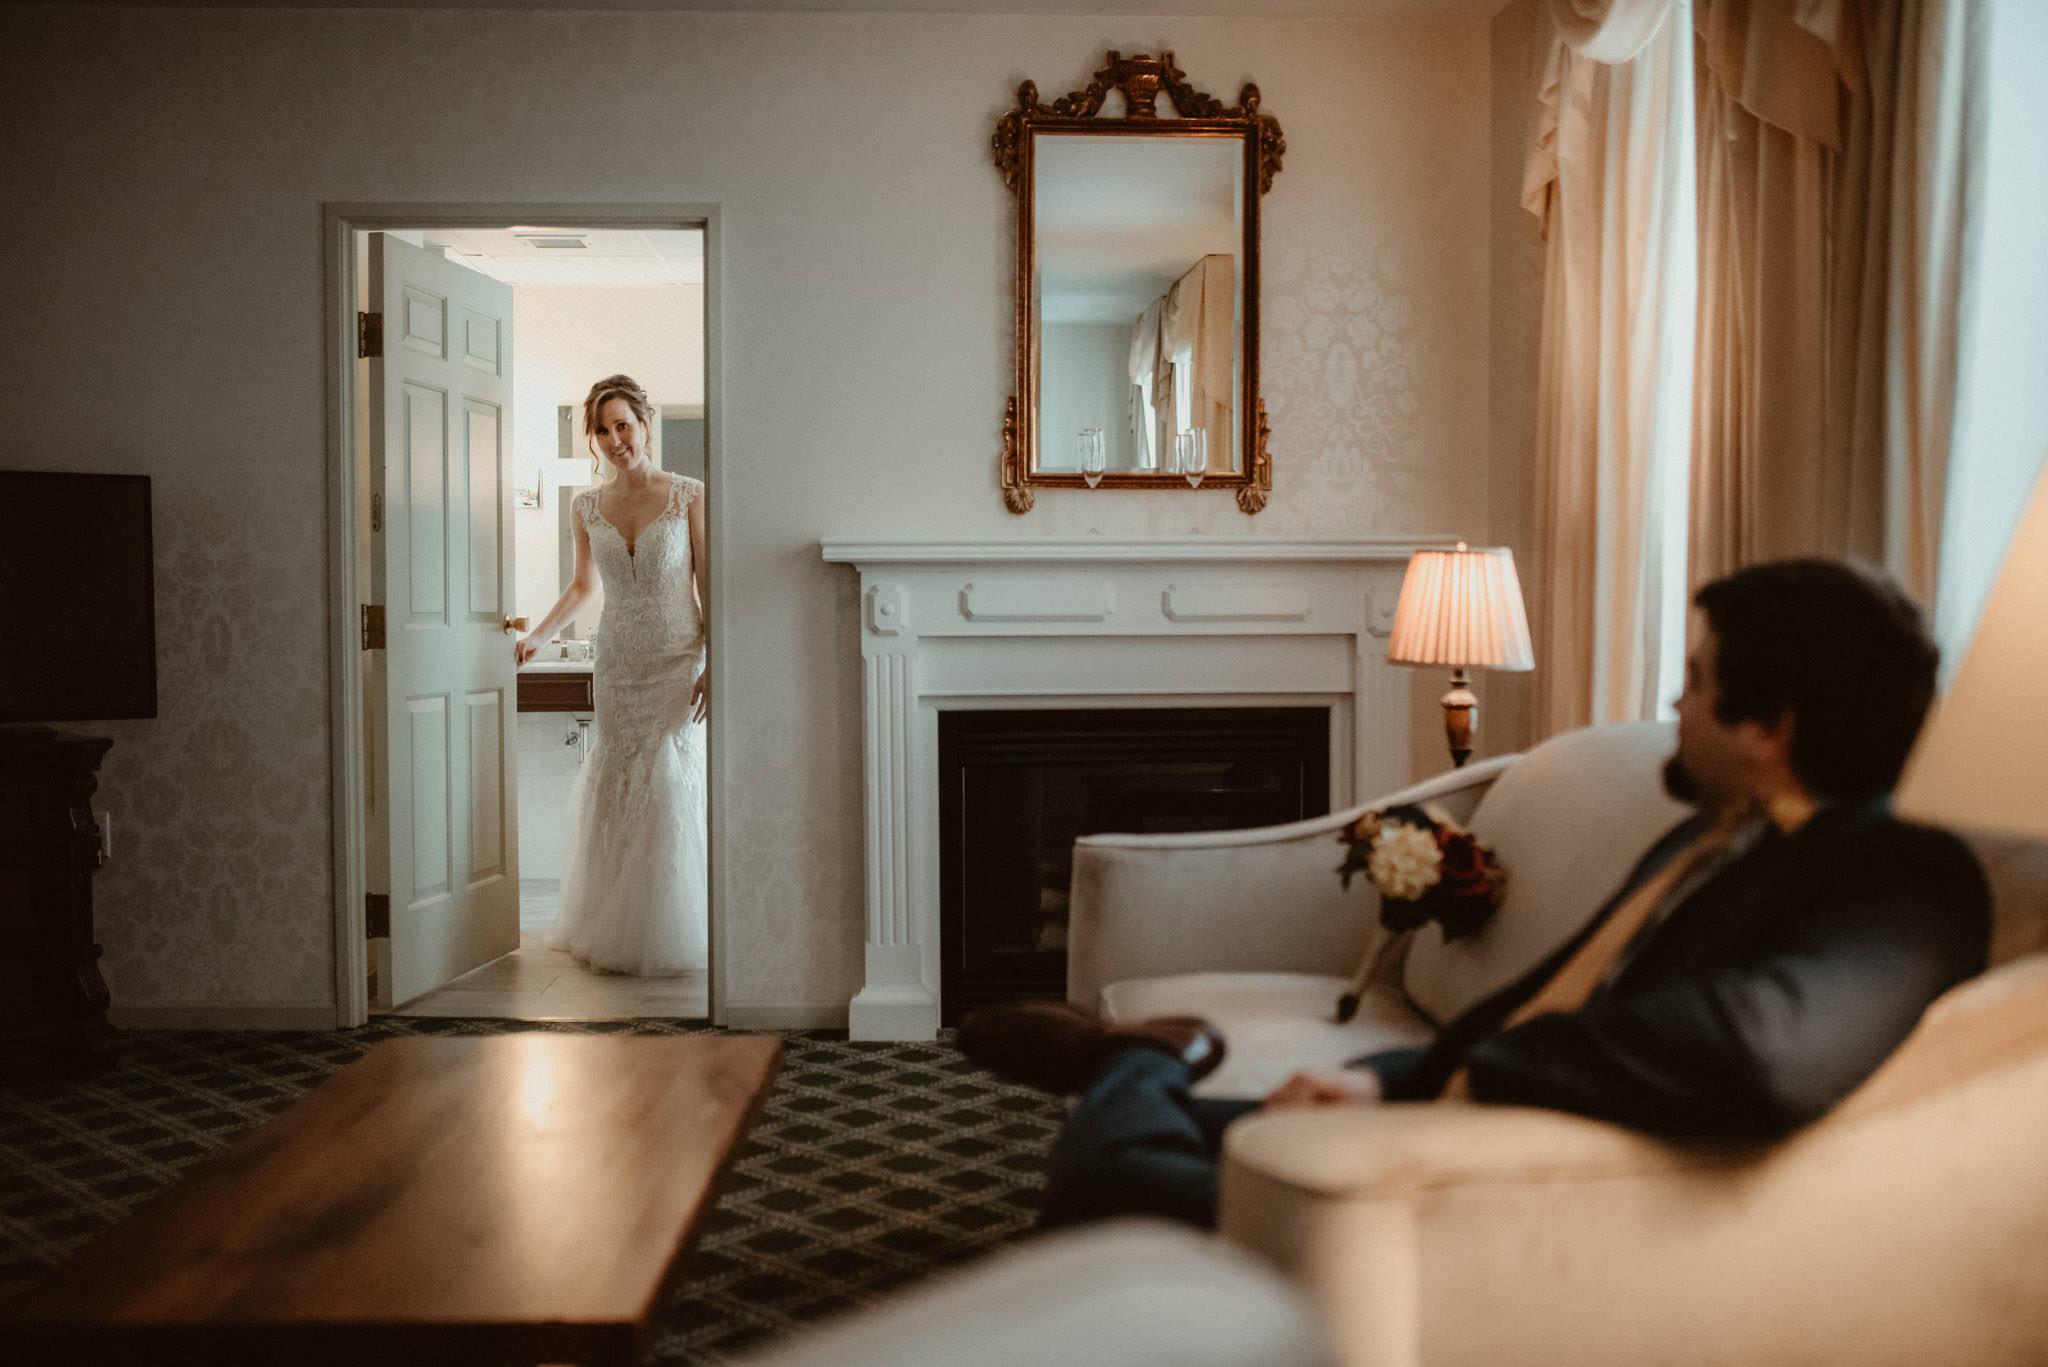 First look at the Landmark Inn in Marquette, MI